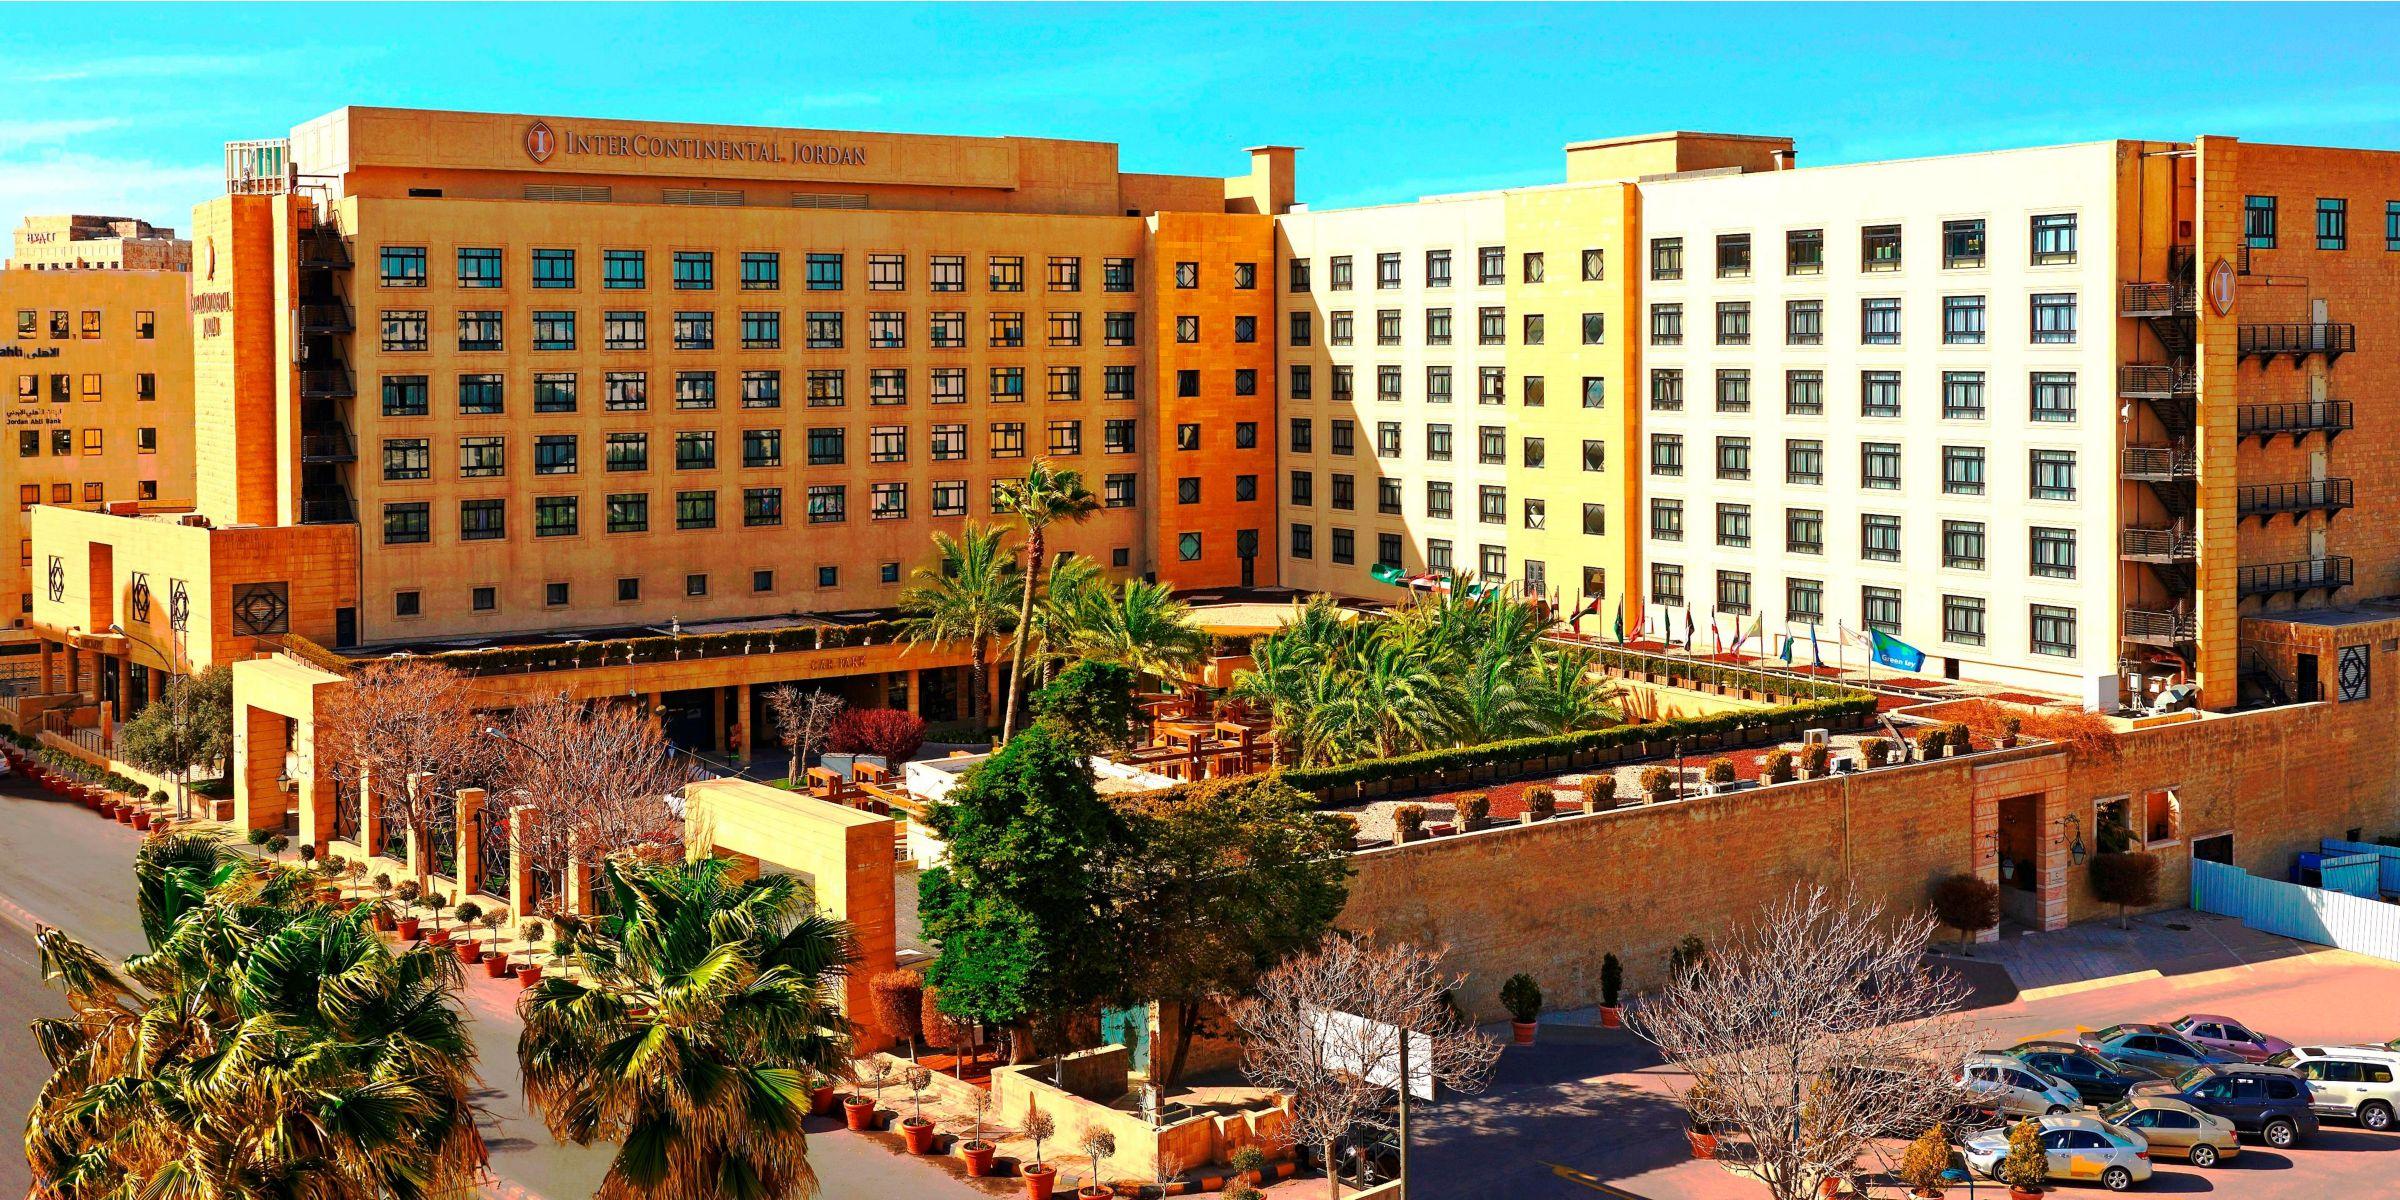 Intercontinental Jordan Hotel Exterior